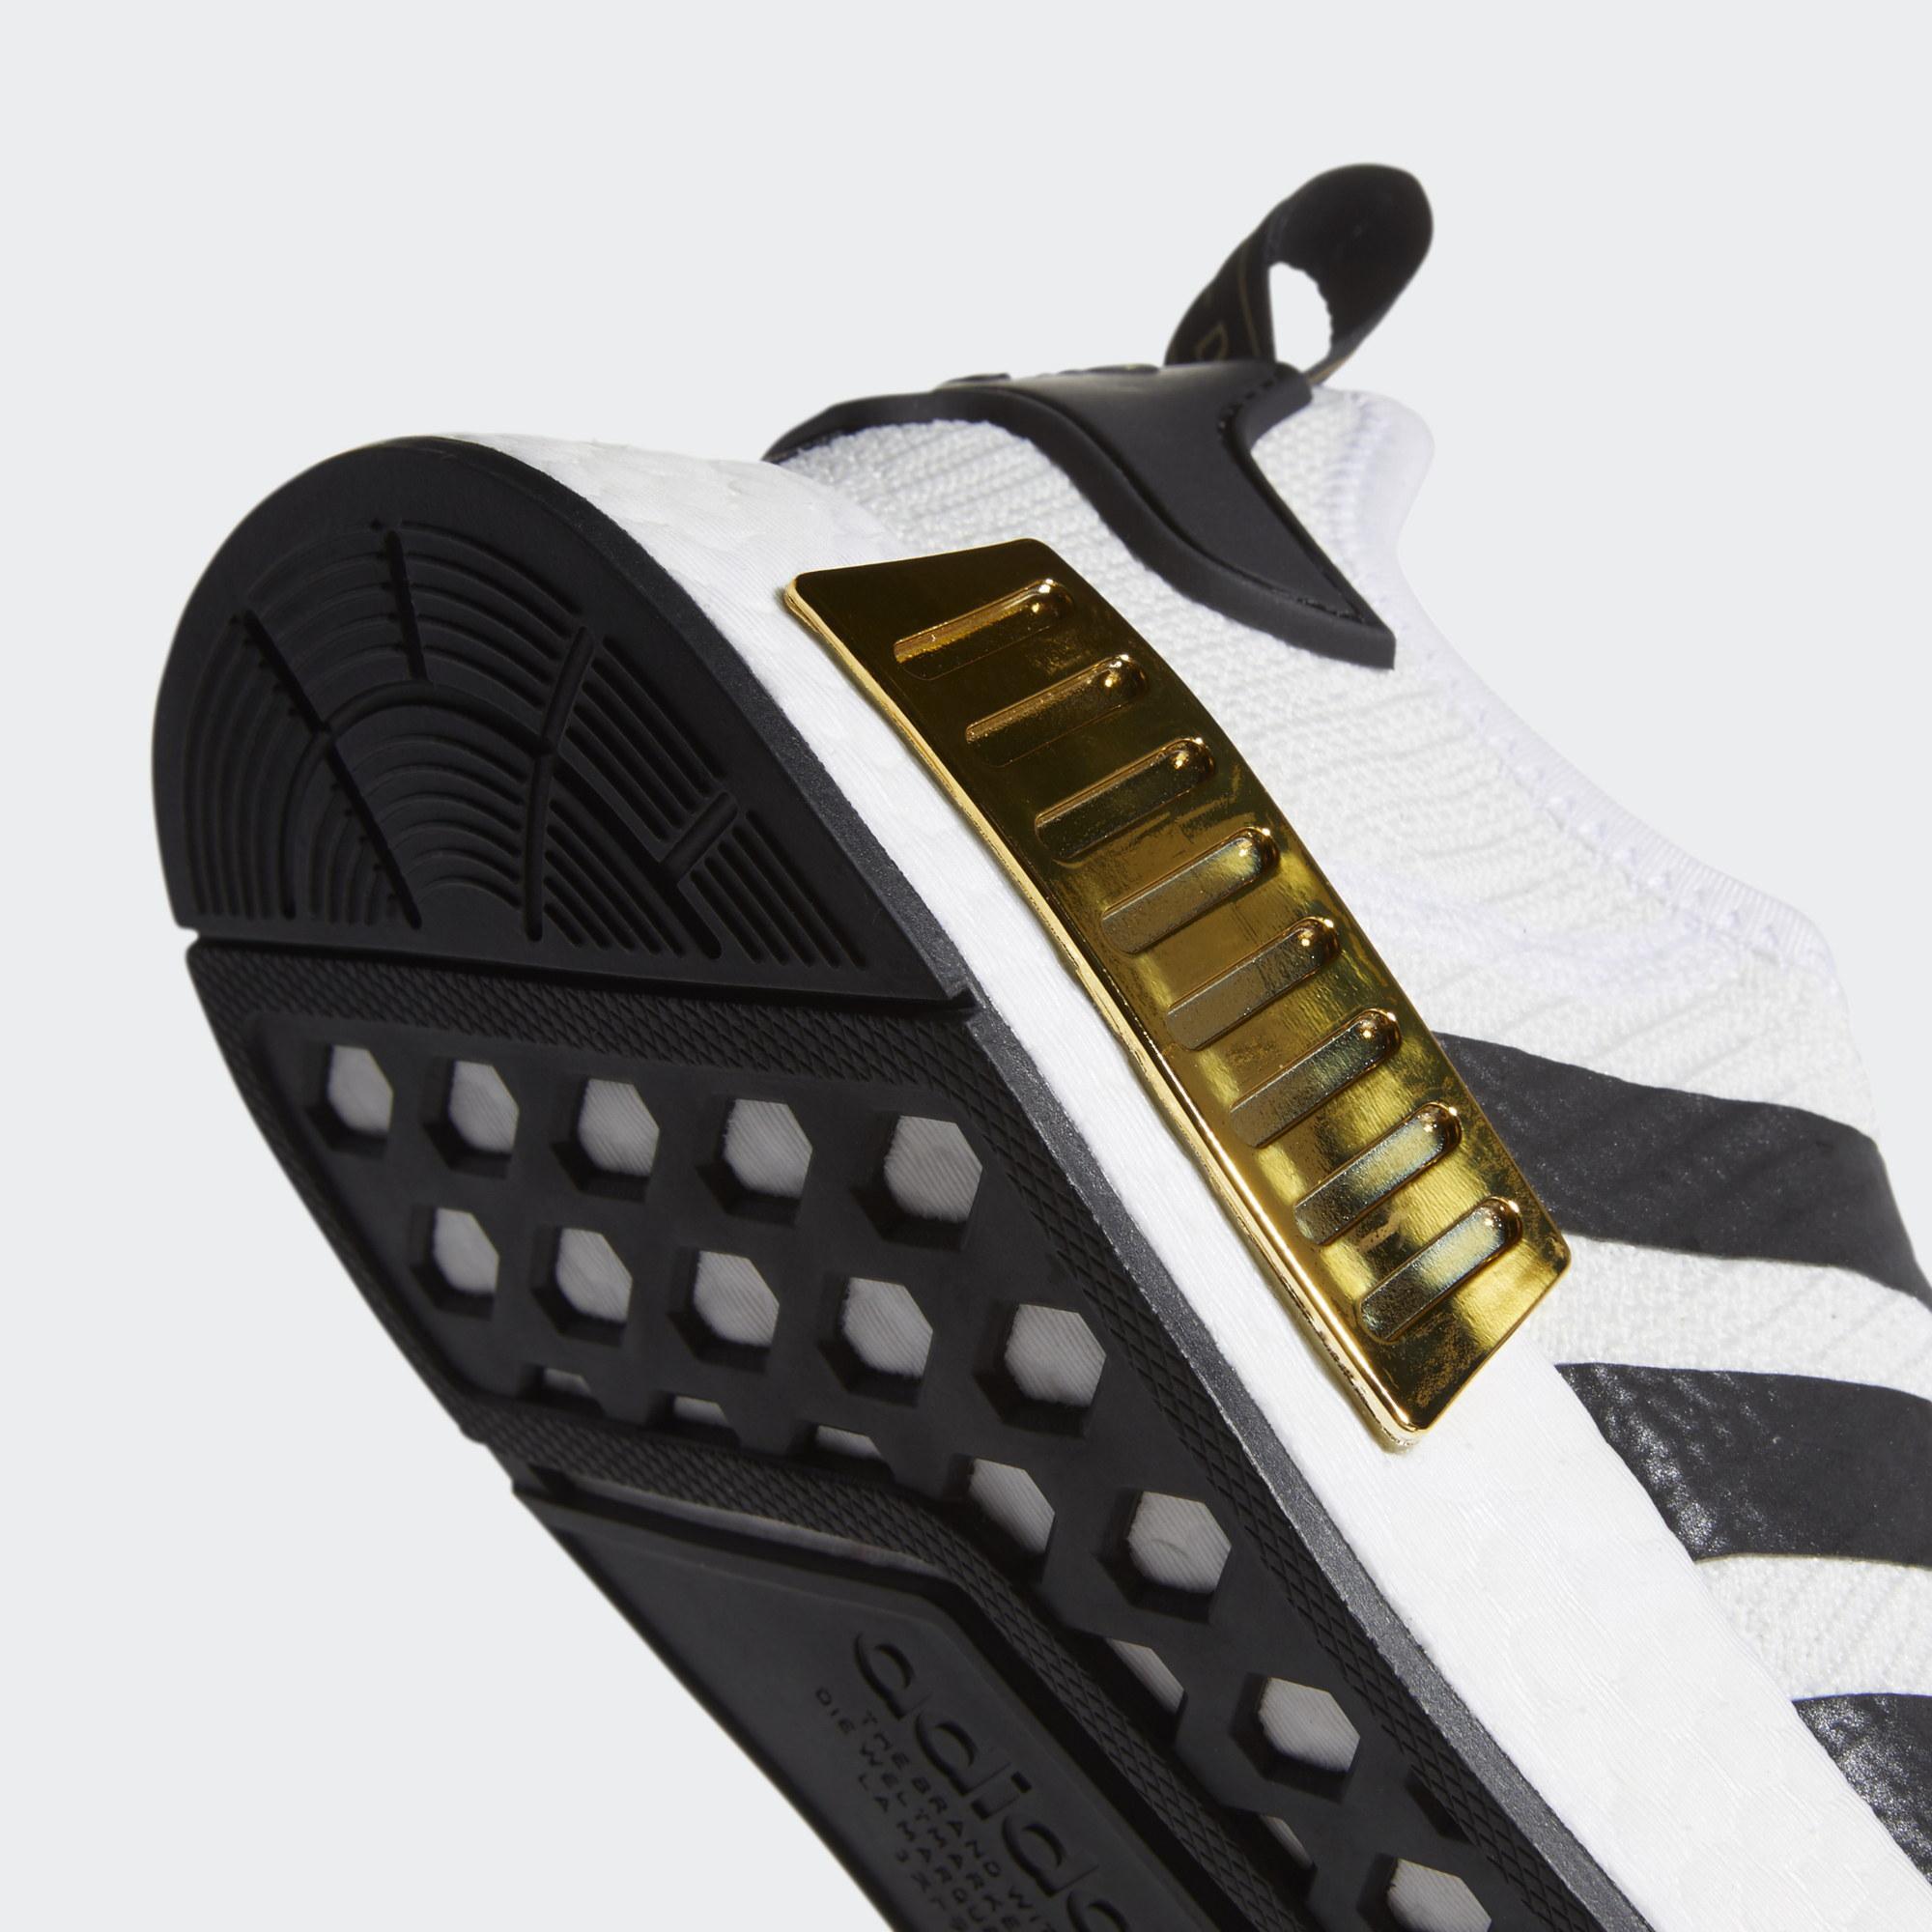 【ADIDAS】NMD R1 白黑金 BOOST 休閒 運動 慢跑鞋 男款 EG5662(palace store) 4